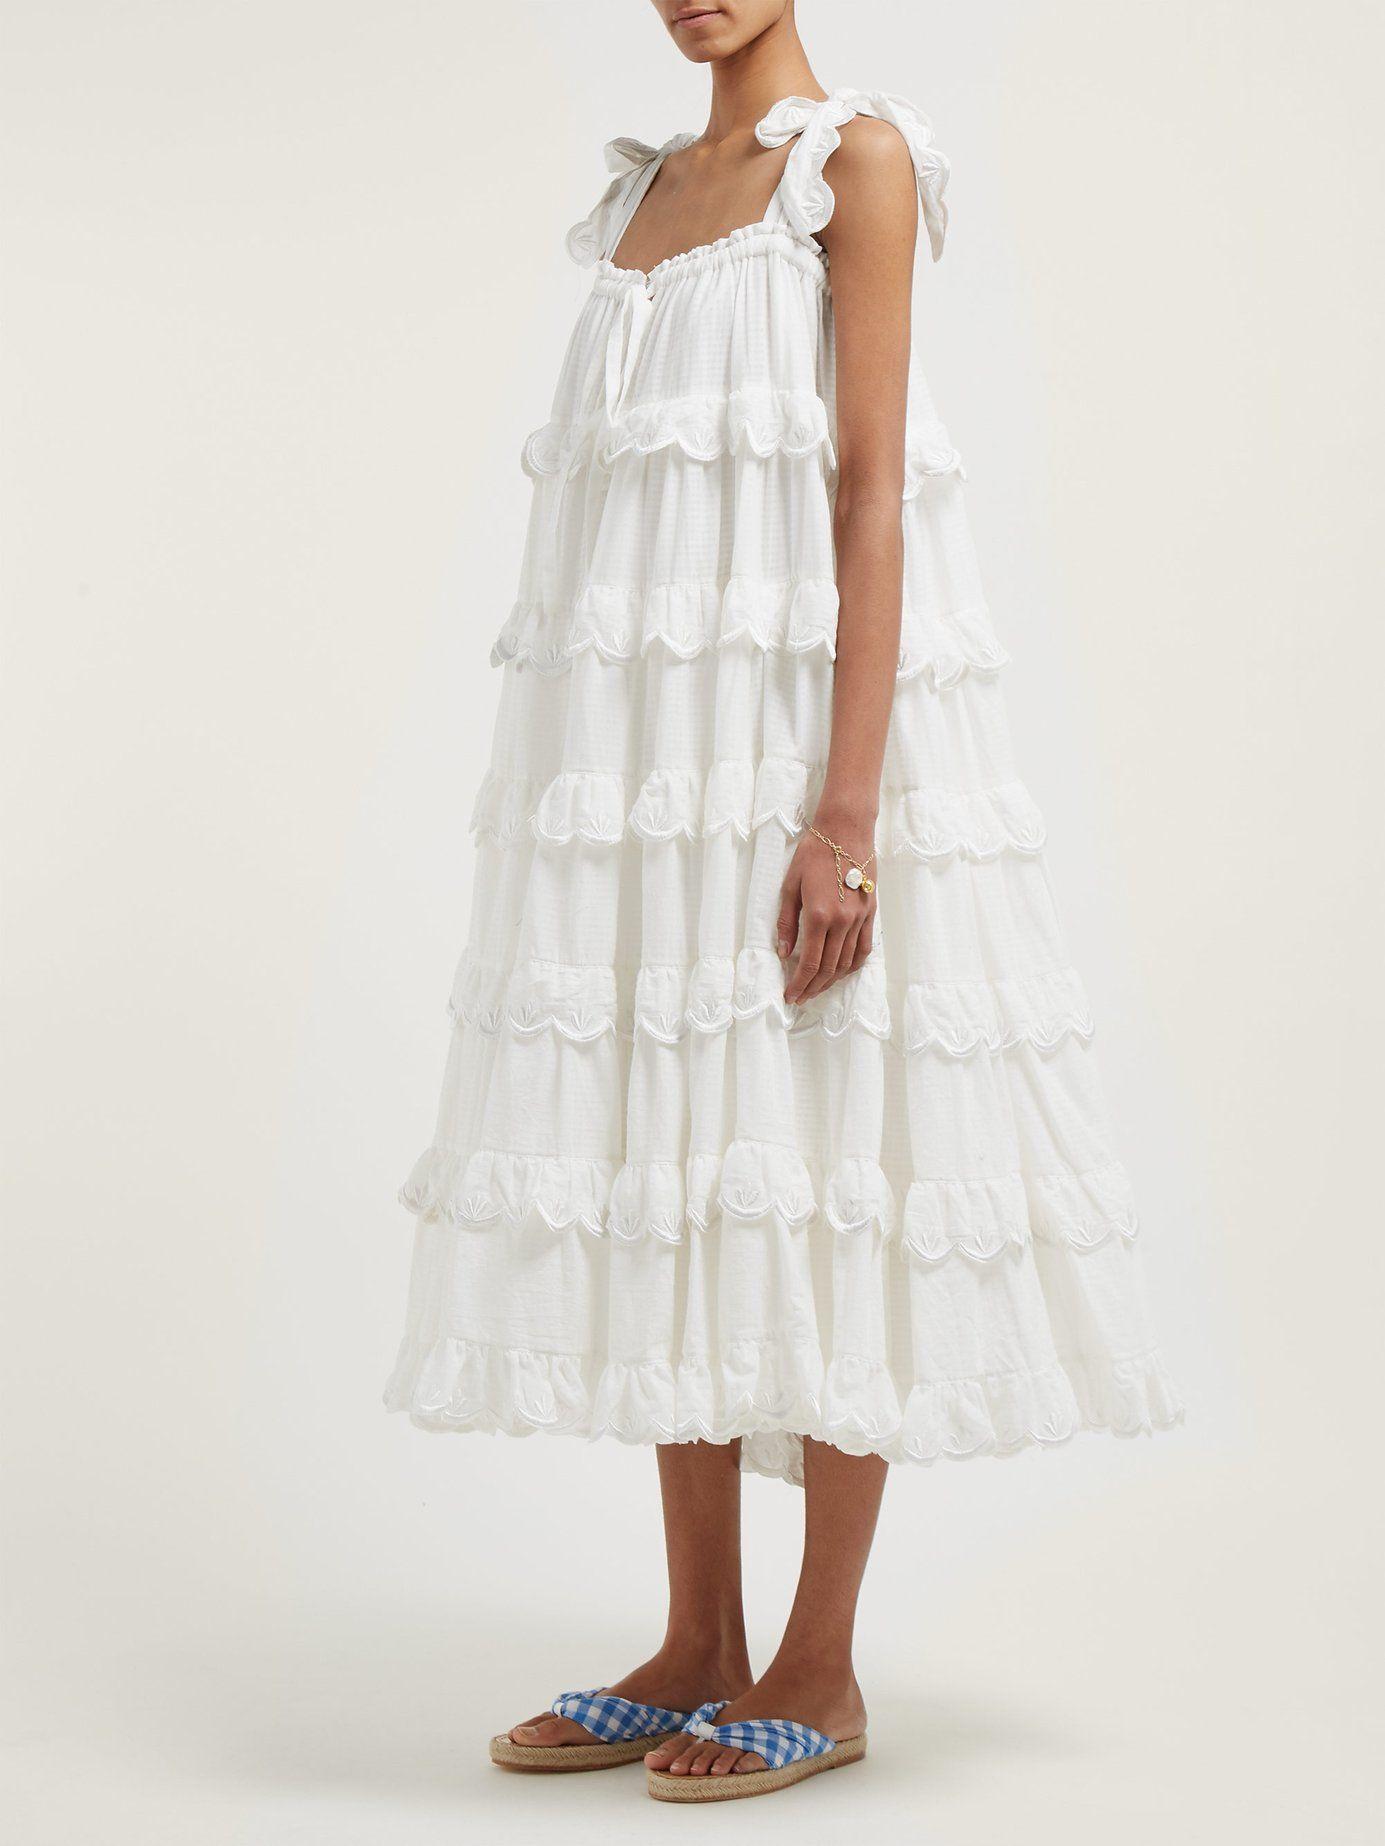 Iva Biigdres Tiered Cotton Midi Dress Innika Choo Cotton Midi Dress Tiered Midi Dress Dresses [ 1846 x 1385 Pixel ]